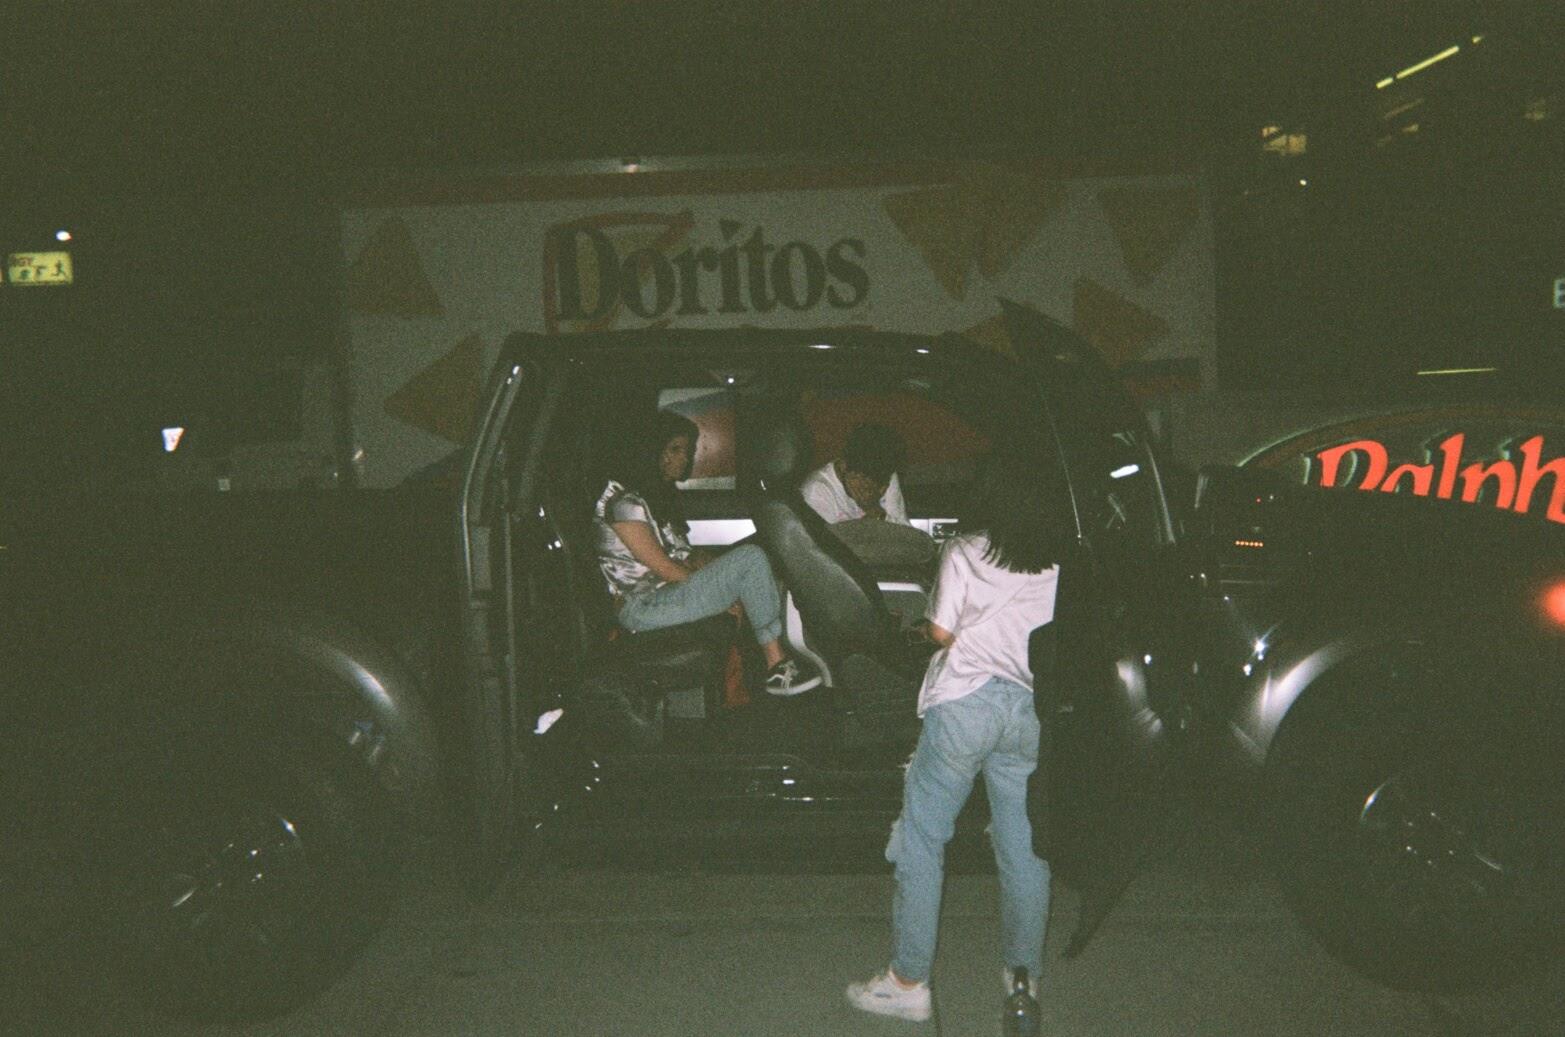 Doritos.jpg